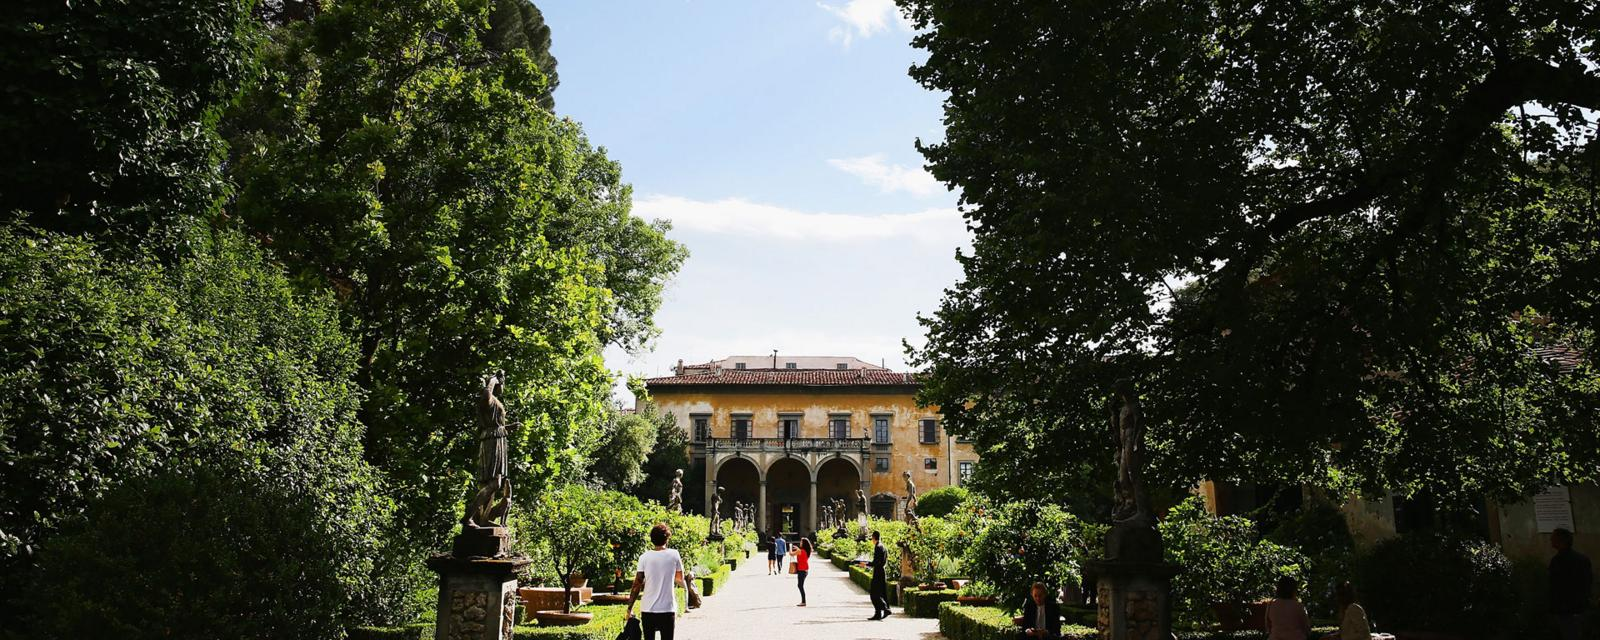 Florence's Palazzo Corsini